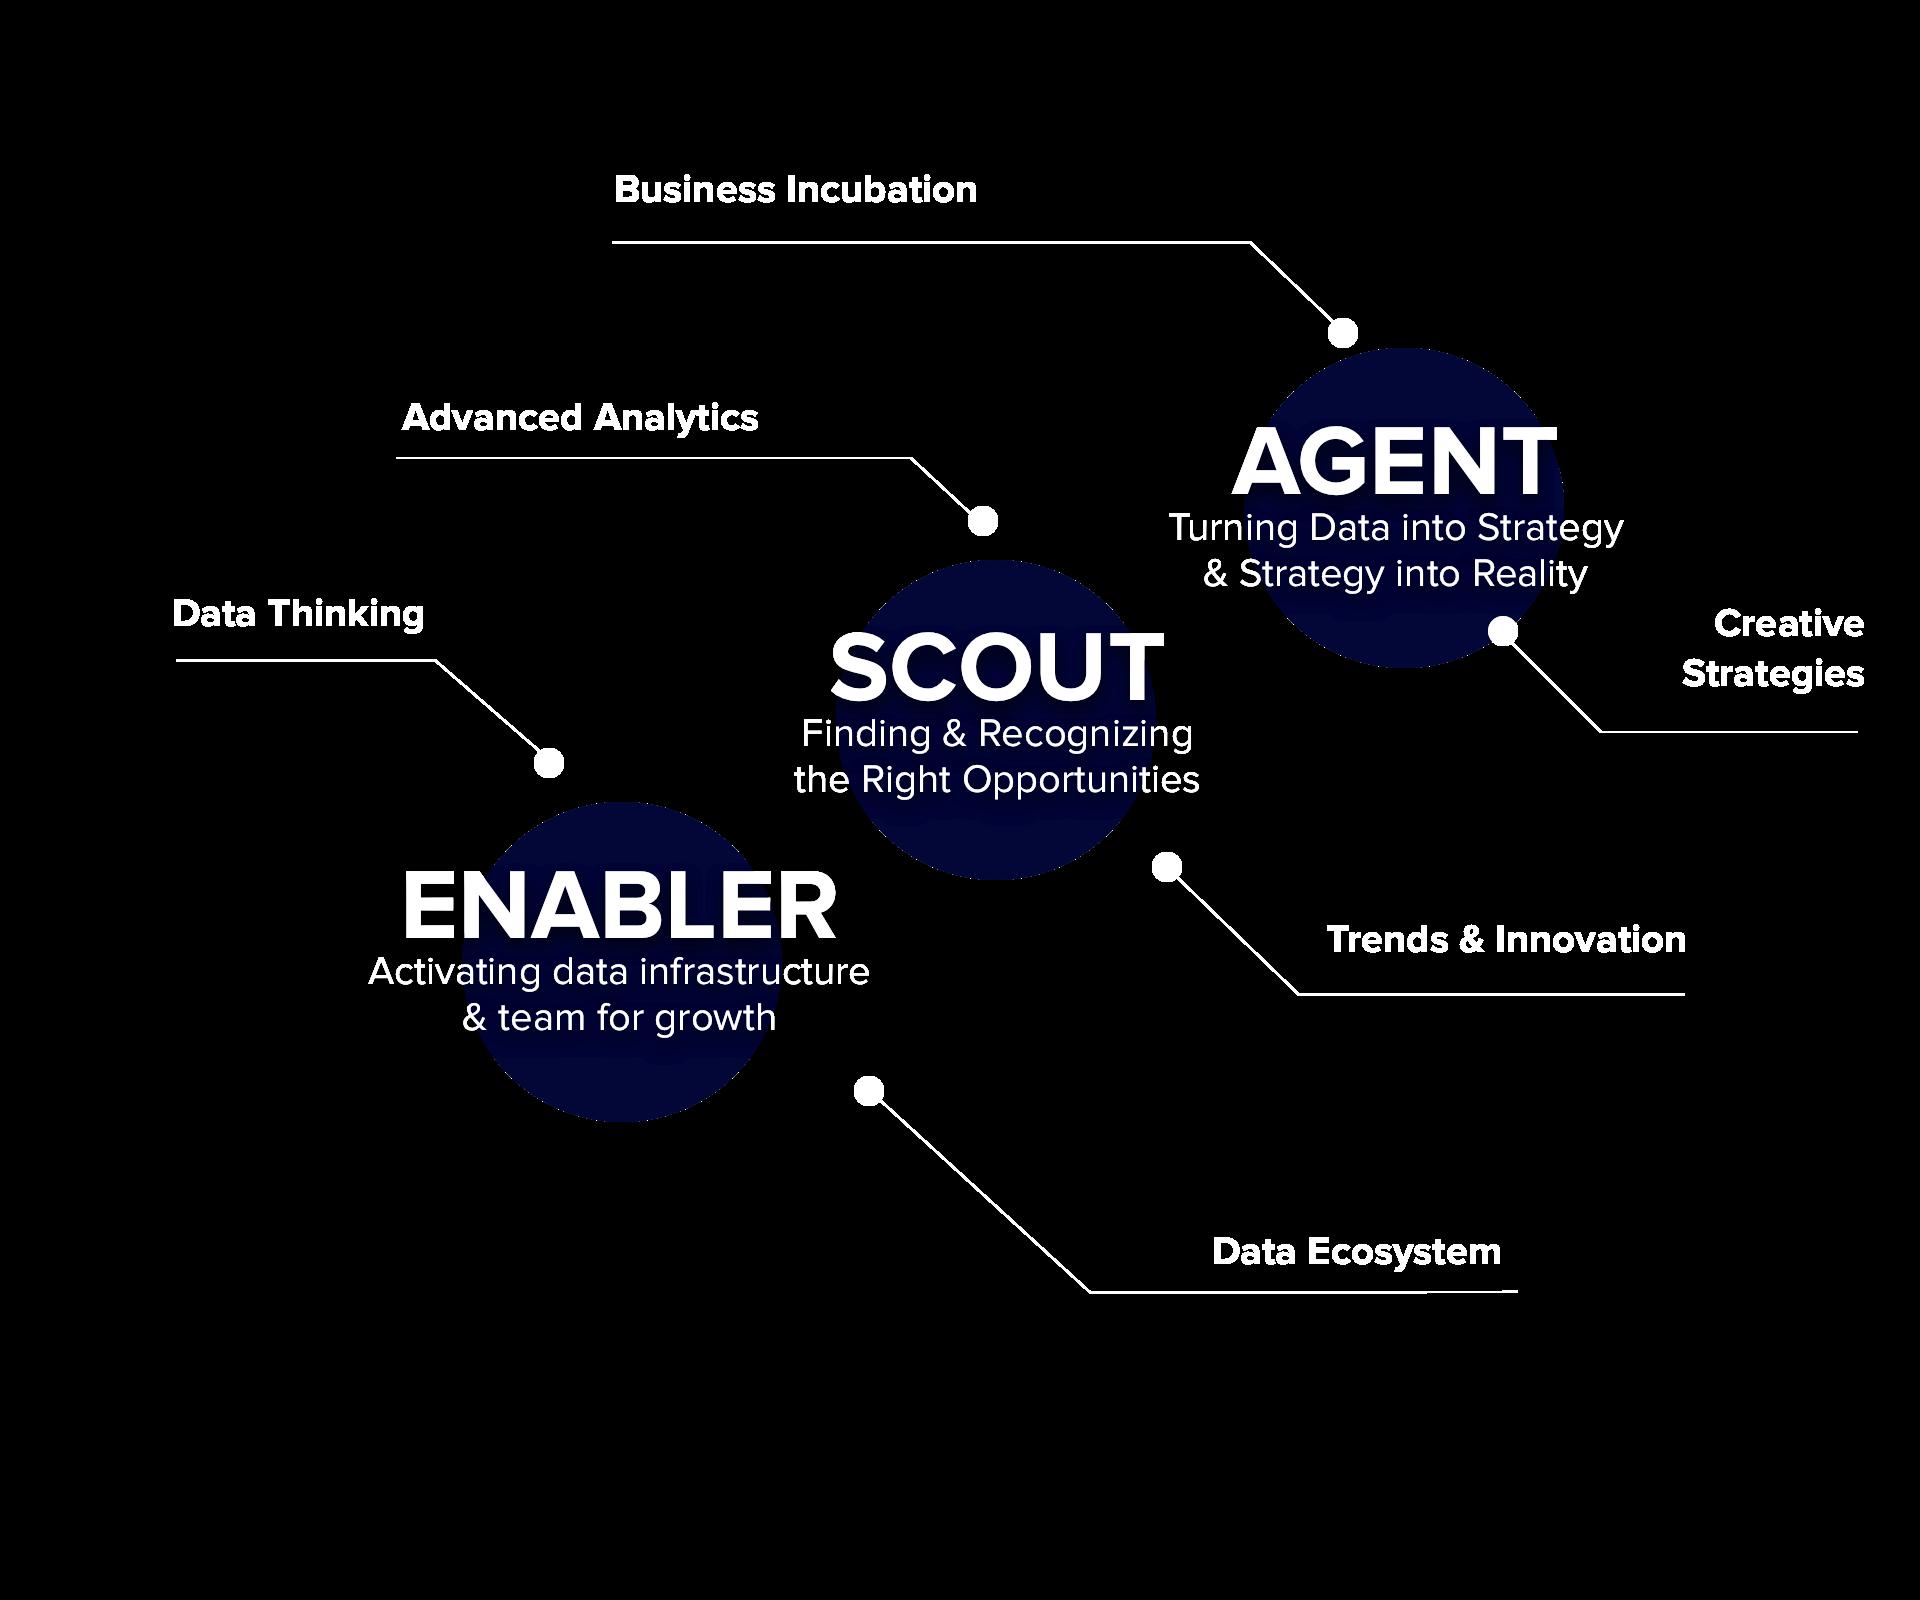 Service Scout